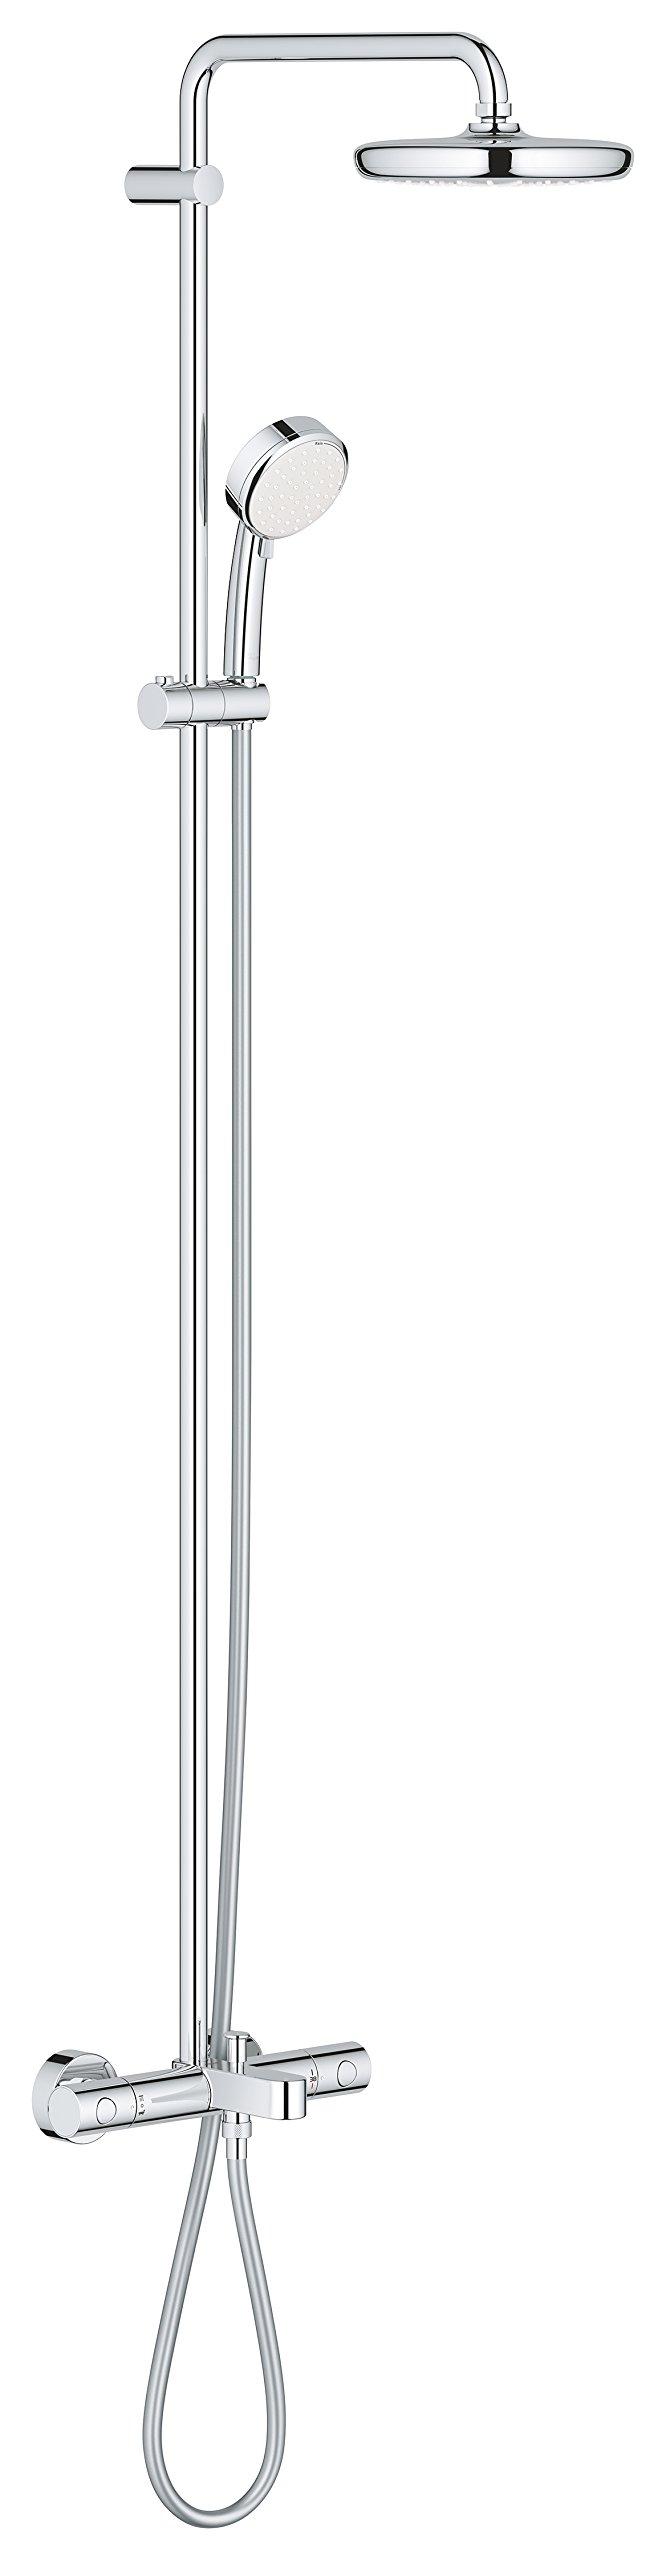 Grohe Tempesta Cosmopolitan 210 - Sistema de ducha con termostato ...